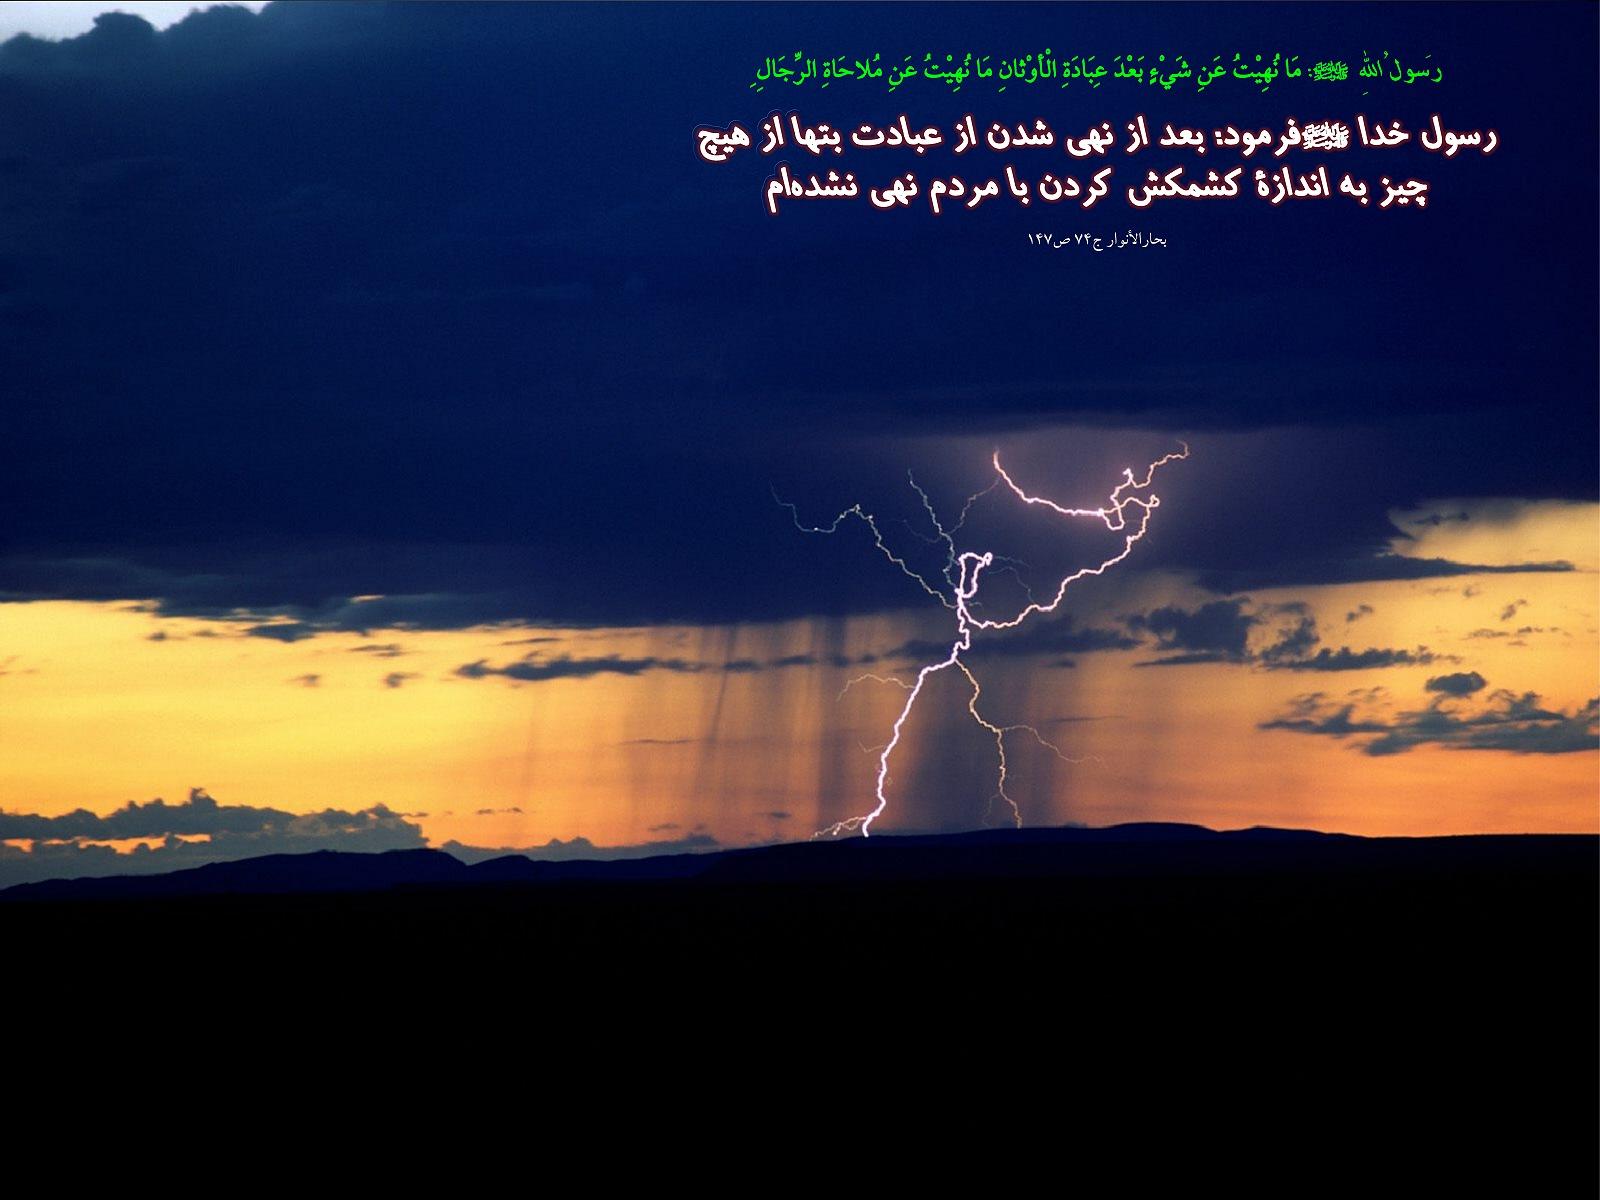 http://mhkh1972.gohardasht.com/uploaded/_CE0BD327-BC65-4CC8-A838-385BA8BCD4D2_.jpg